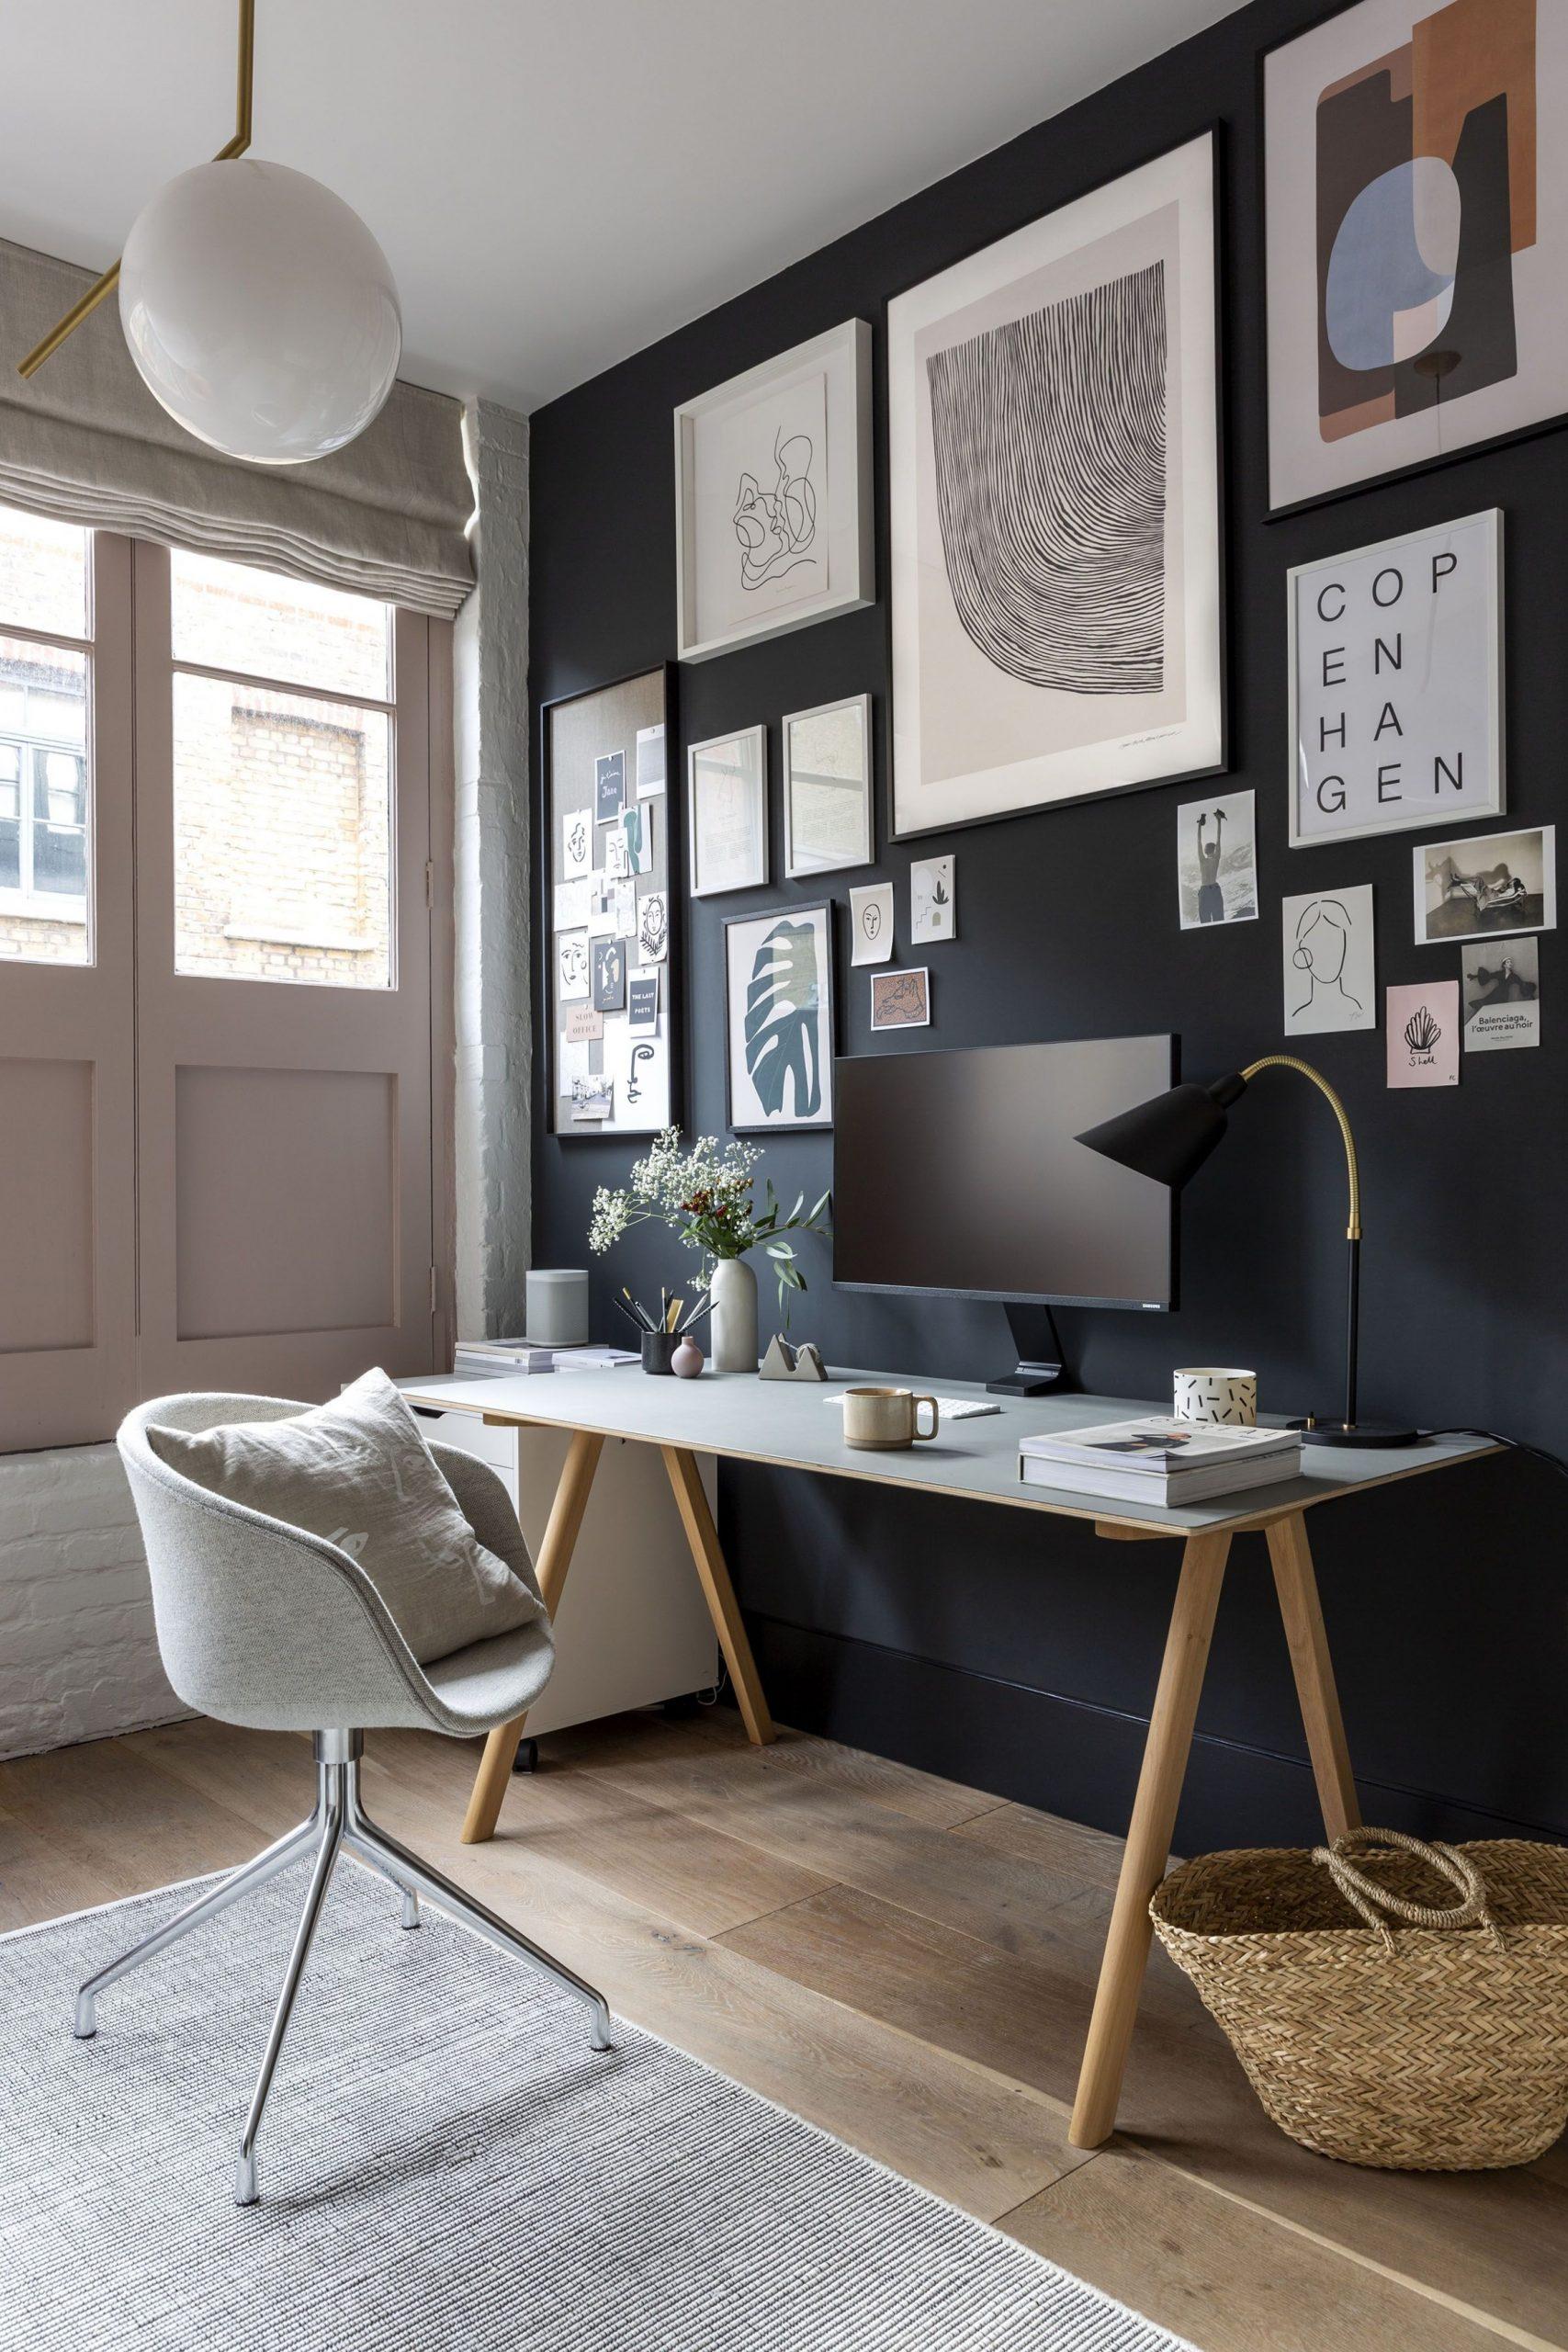 A cool, minimalist home office in a Shoreditch loft apartment  - Home Office Ideas Loft